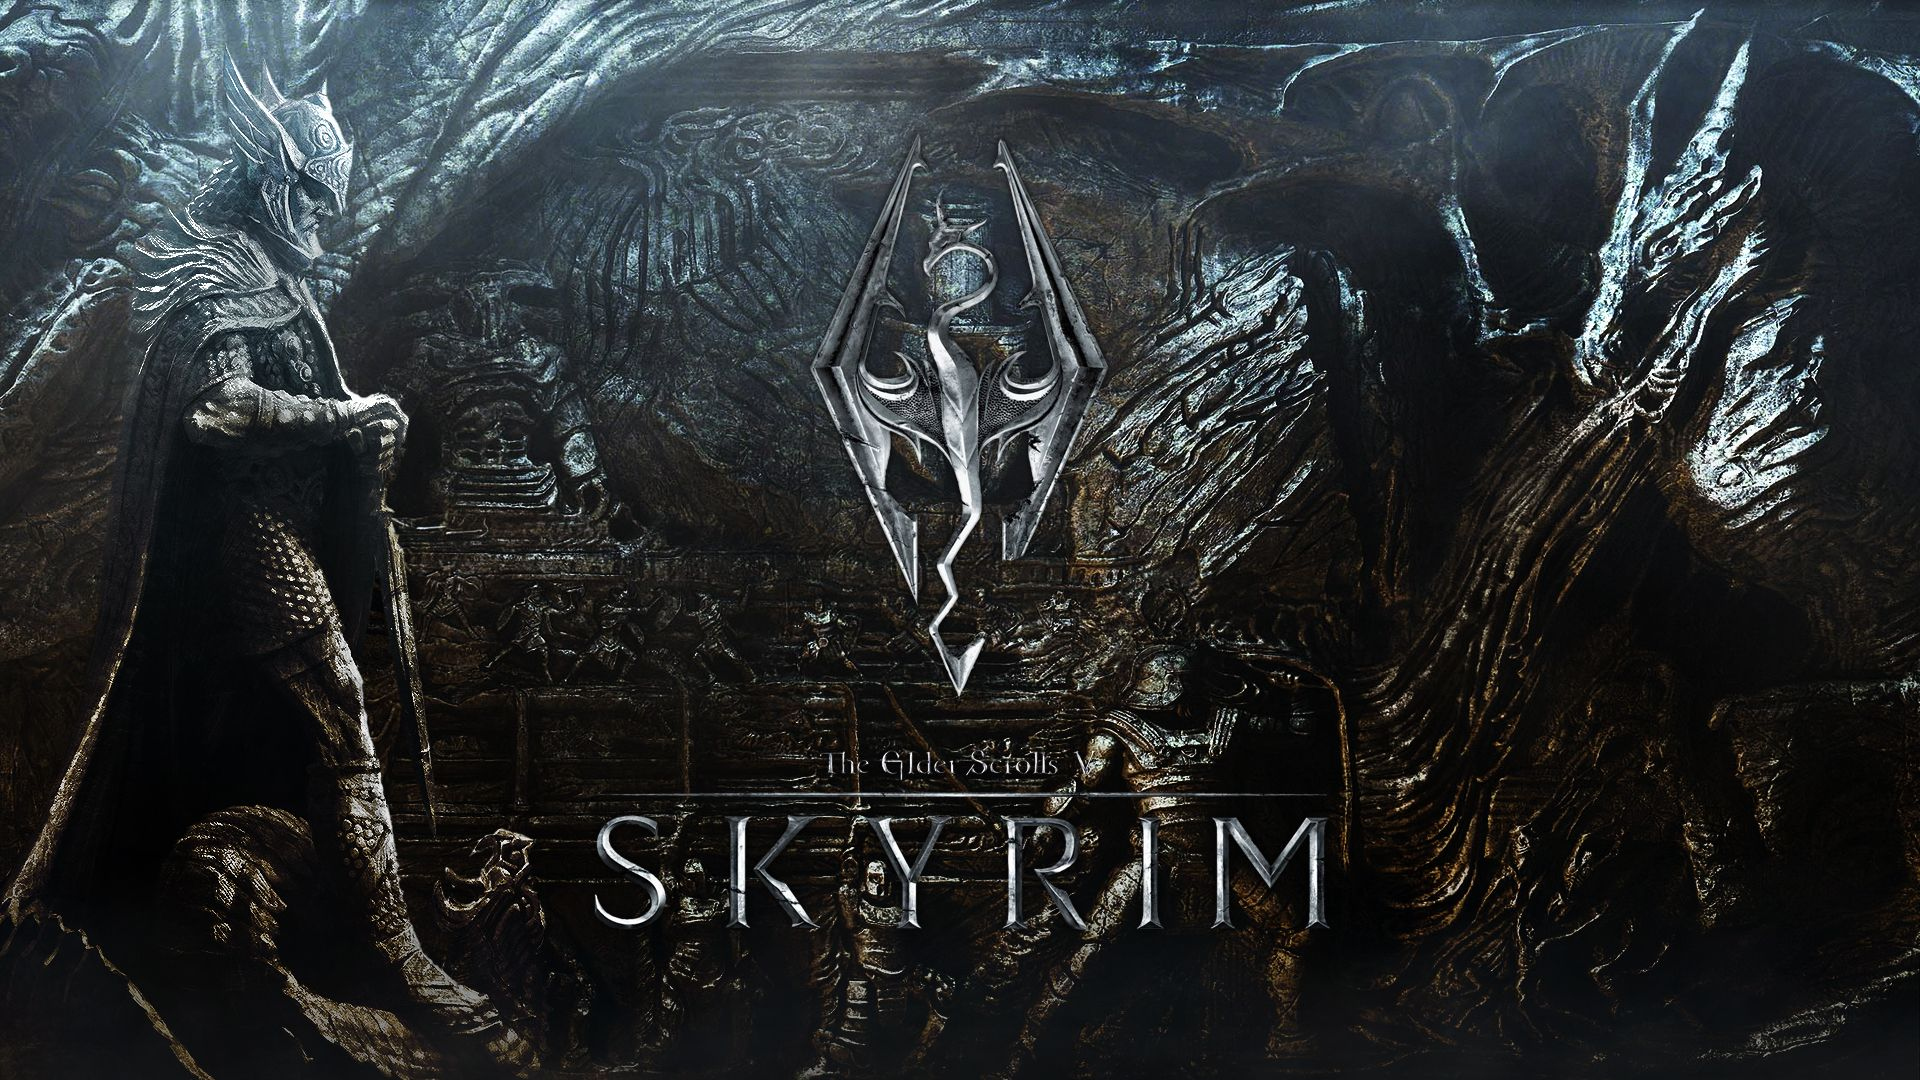 1920x1080 Skyrim Dragonborn 1080p Wallpaper High Quality 4k Hd For Smartphone